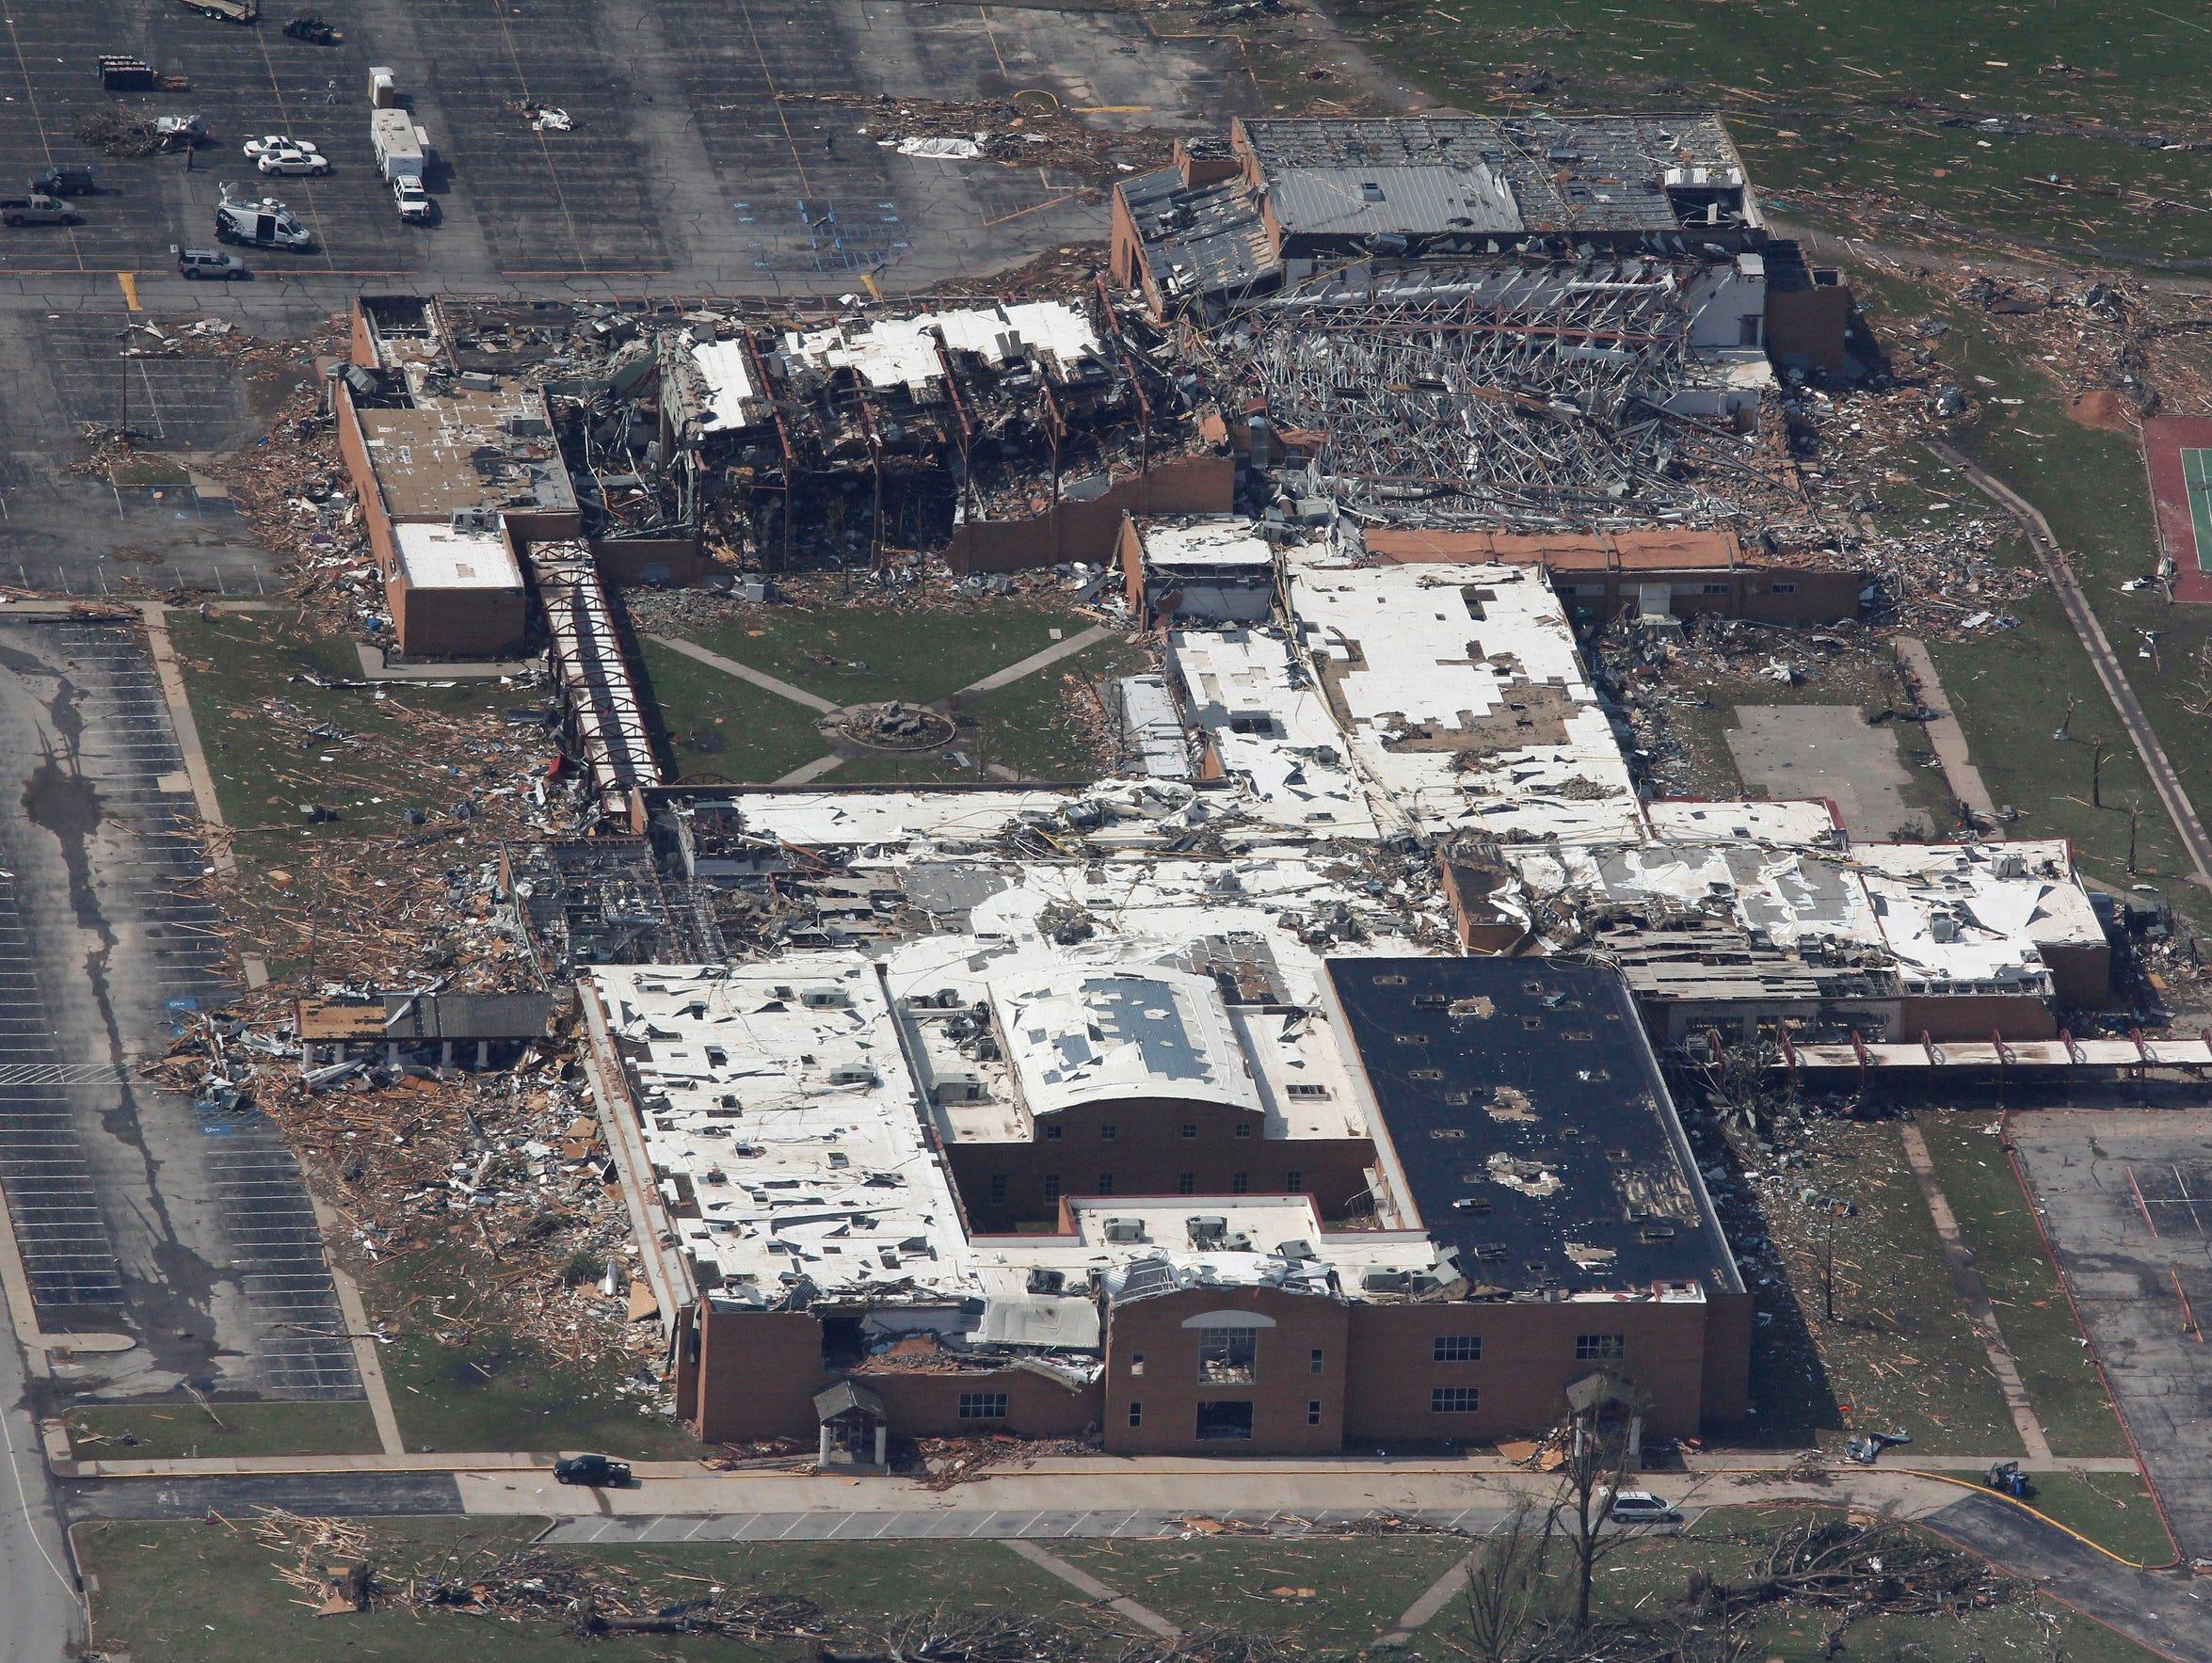 An aerial view of tornado damage at Joplin High School